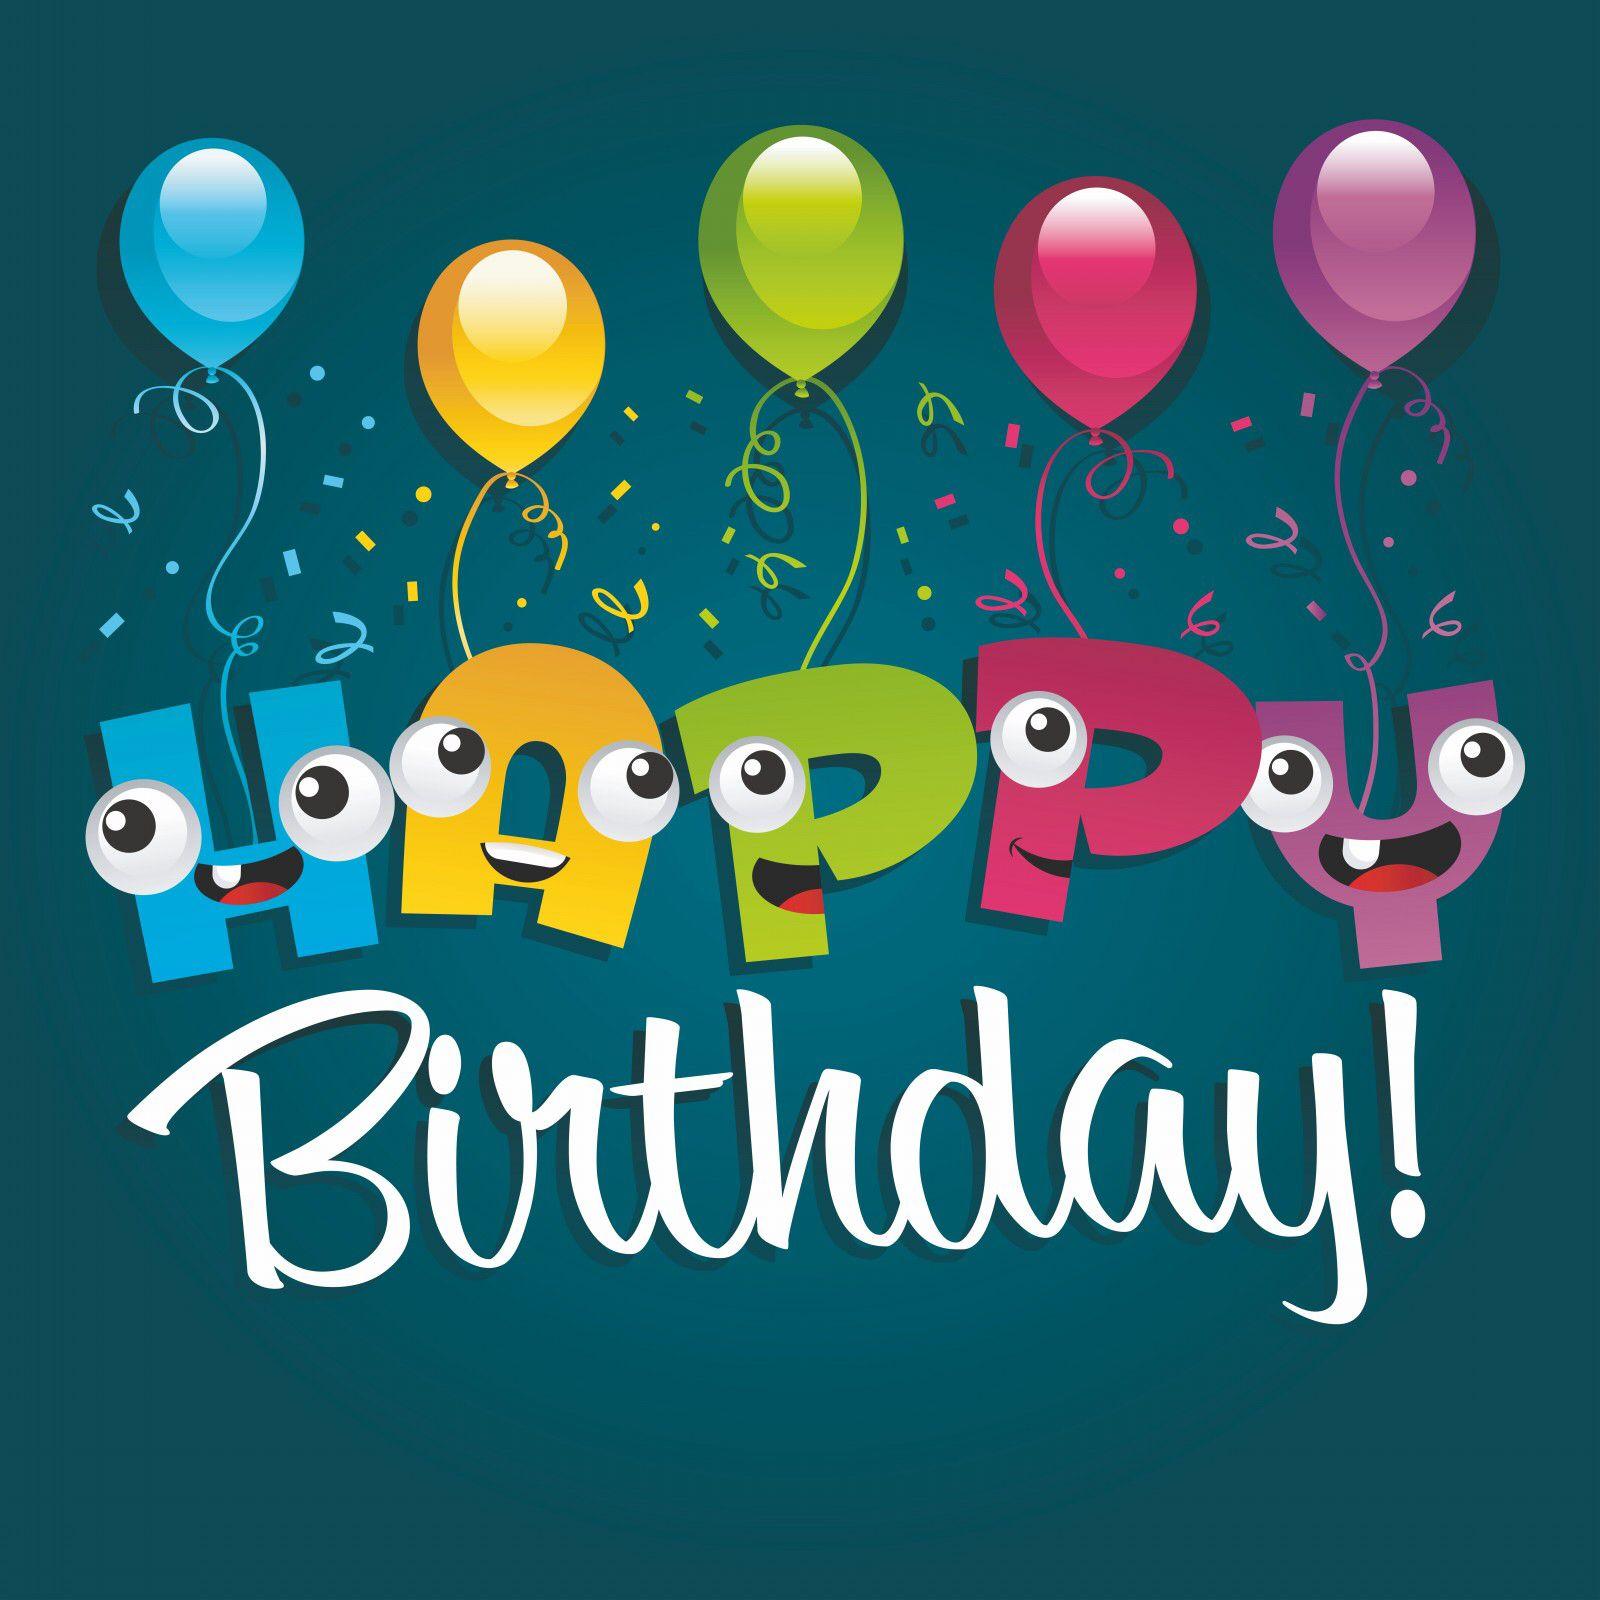 Birthday card design DIY Gift Ideas Pinterest